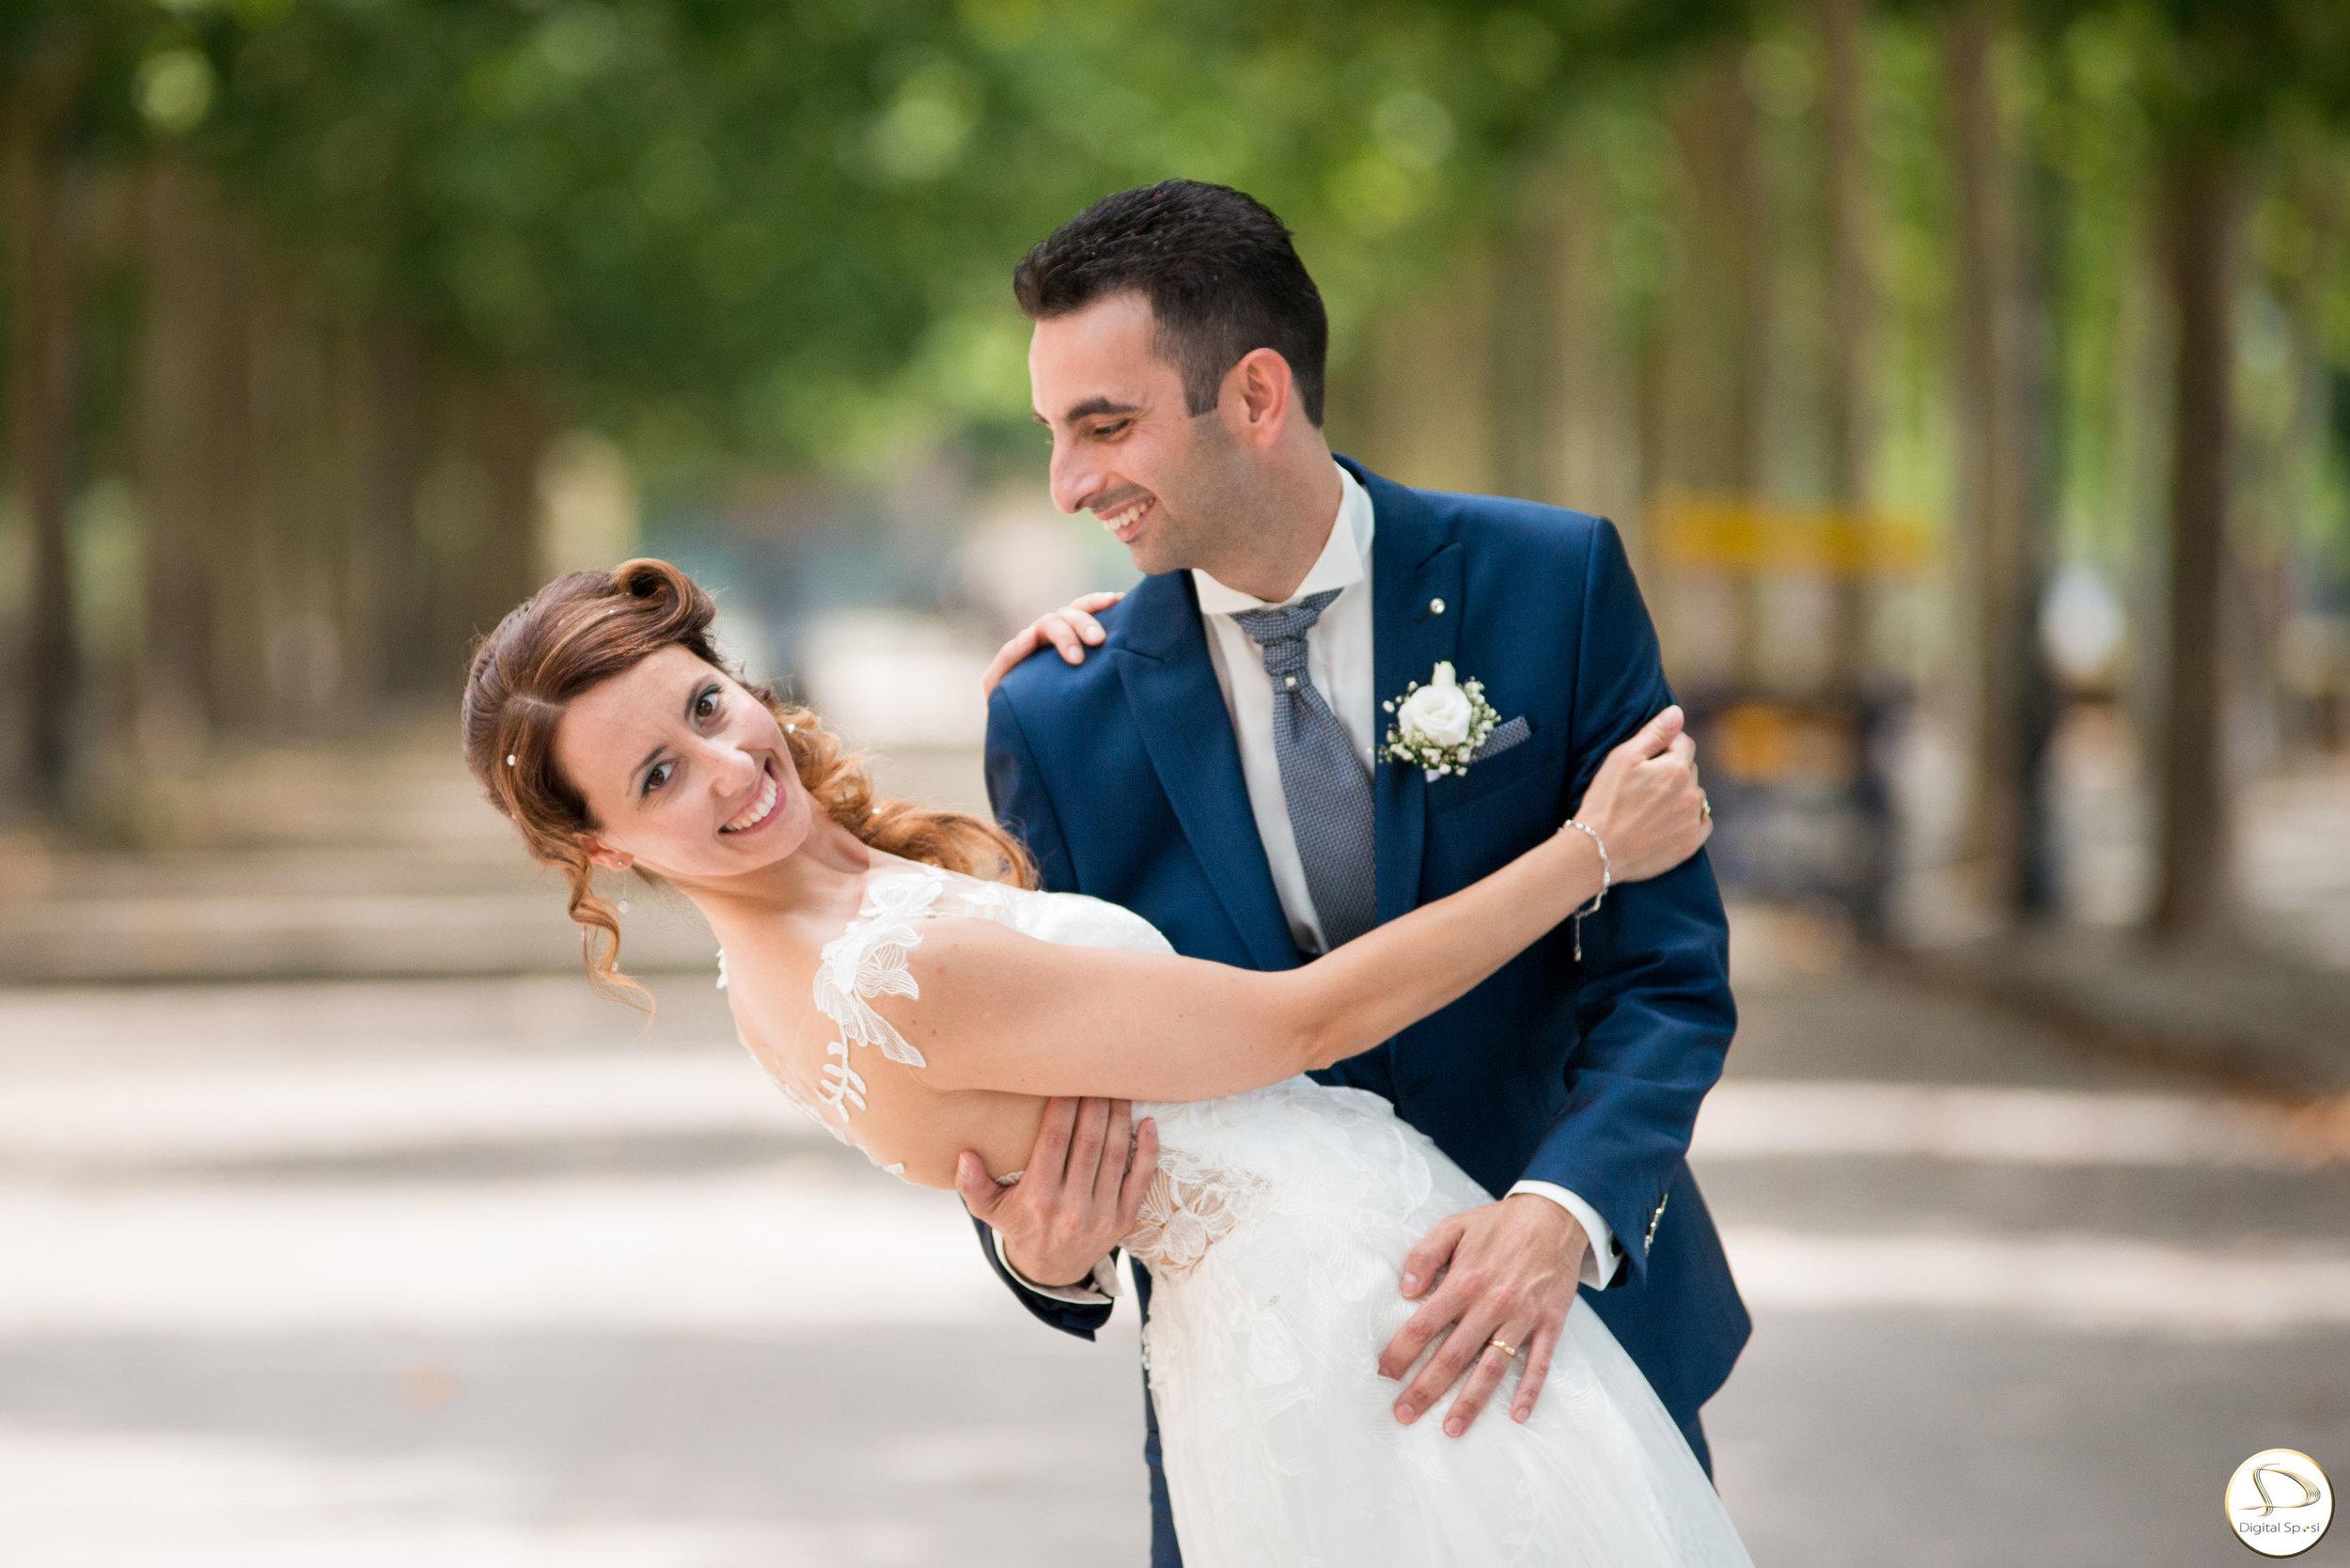 Digital-Sposi-Matrimonio-Enrico-Marinella-Lucca.jpg